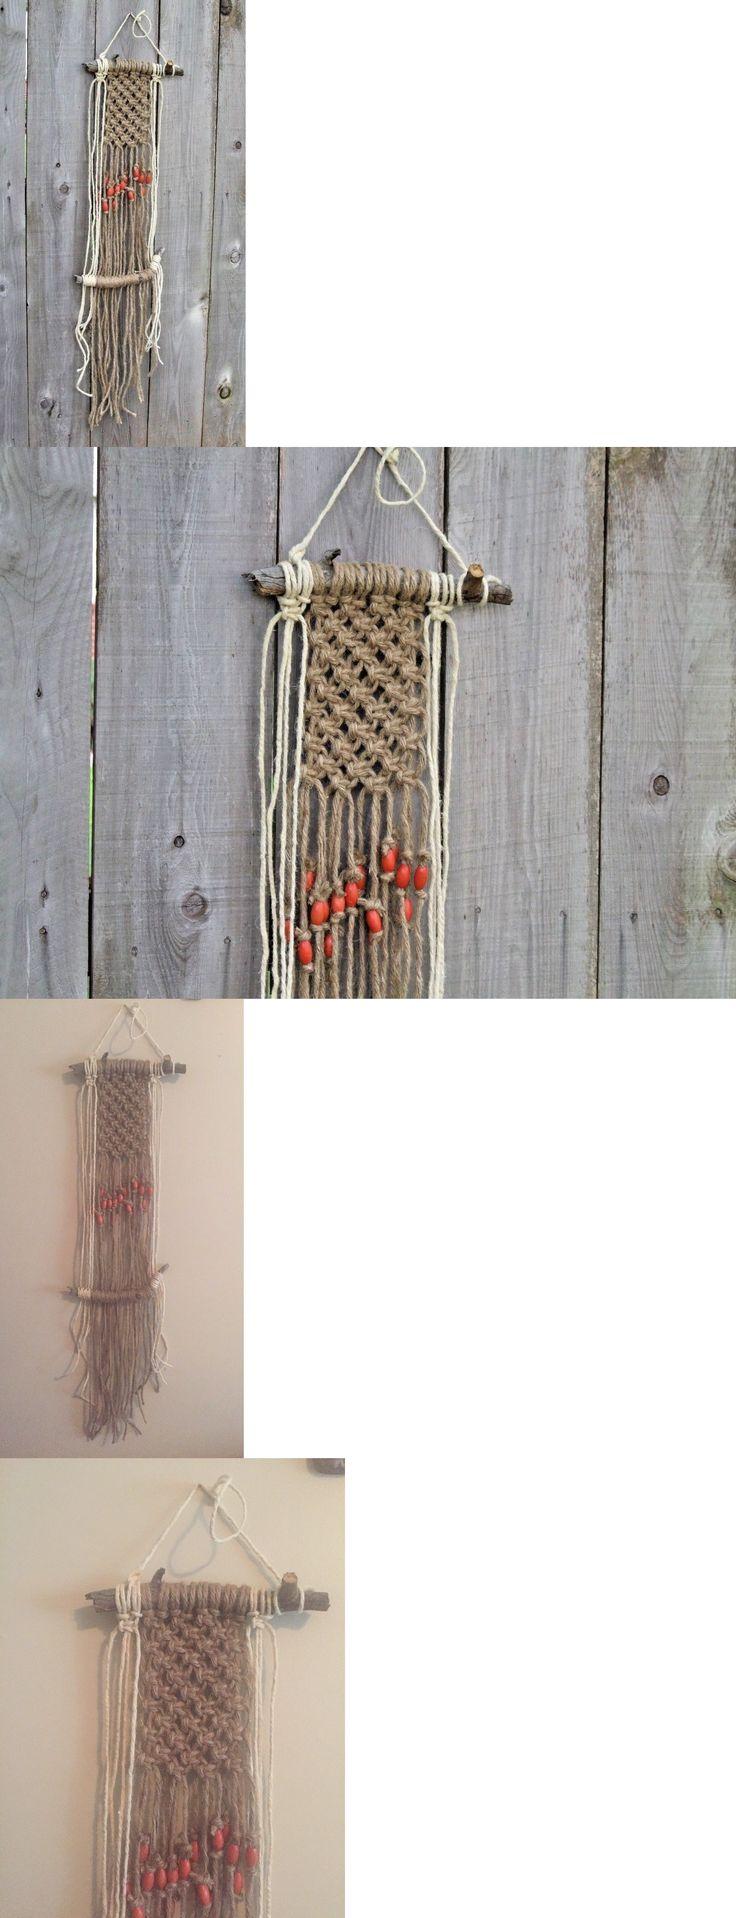 Wall Hangings 83904: New Driftwood-Macrame-Wall-Hanging Jute Boho Hippie Modern Vintage Diy Hgtv -> BUY IT NOW ONLY: $42 on eBay!